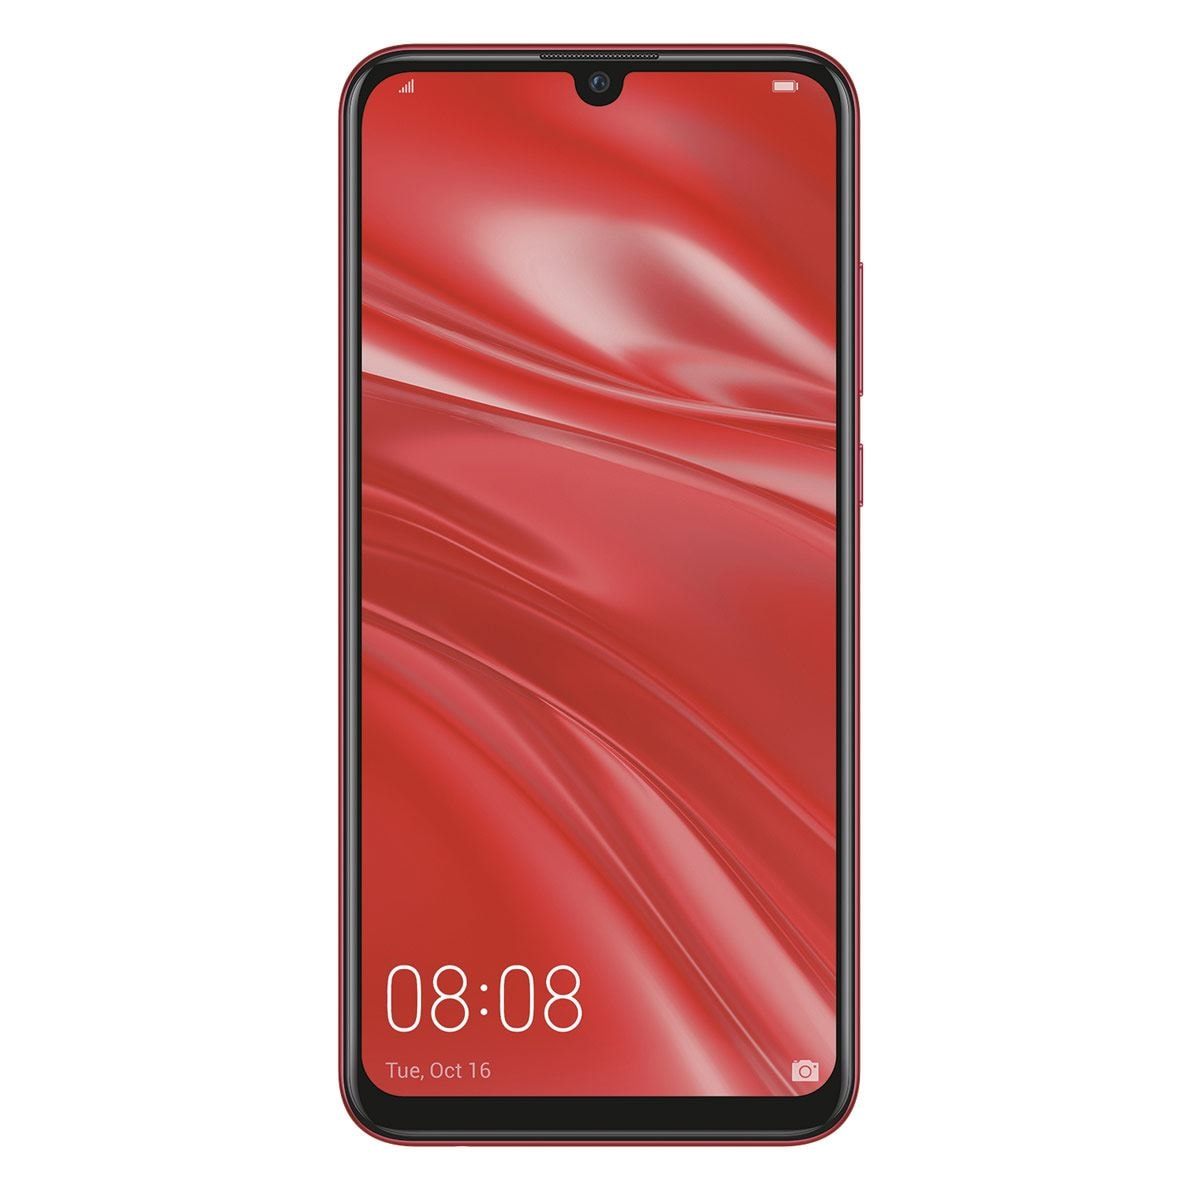 Celular Huawei POTLX3 P-Smart 2019 Color Rojo R9 (Telcel)